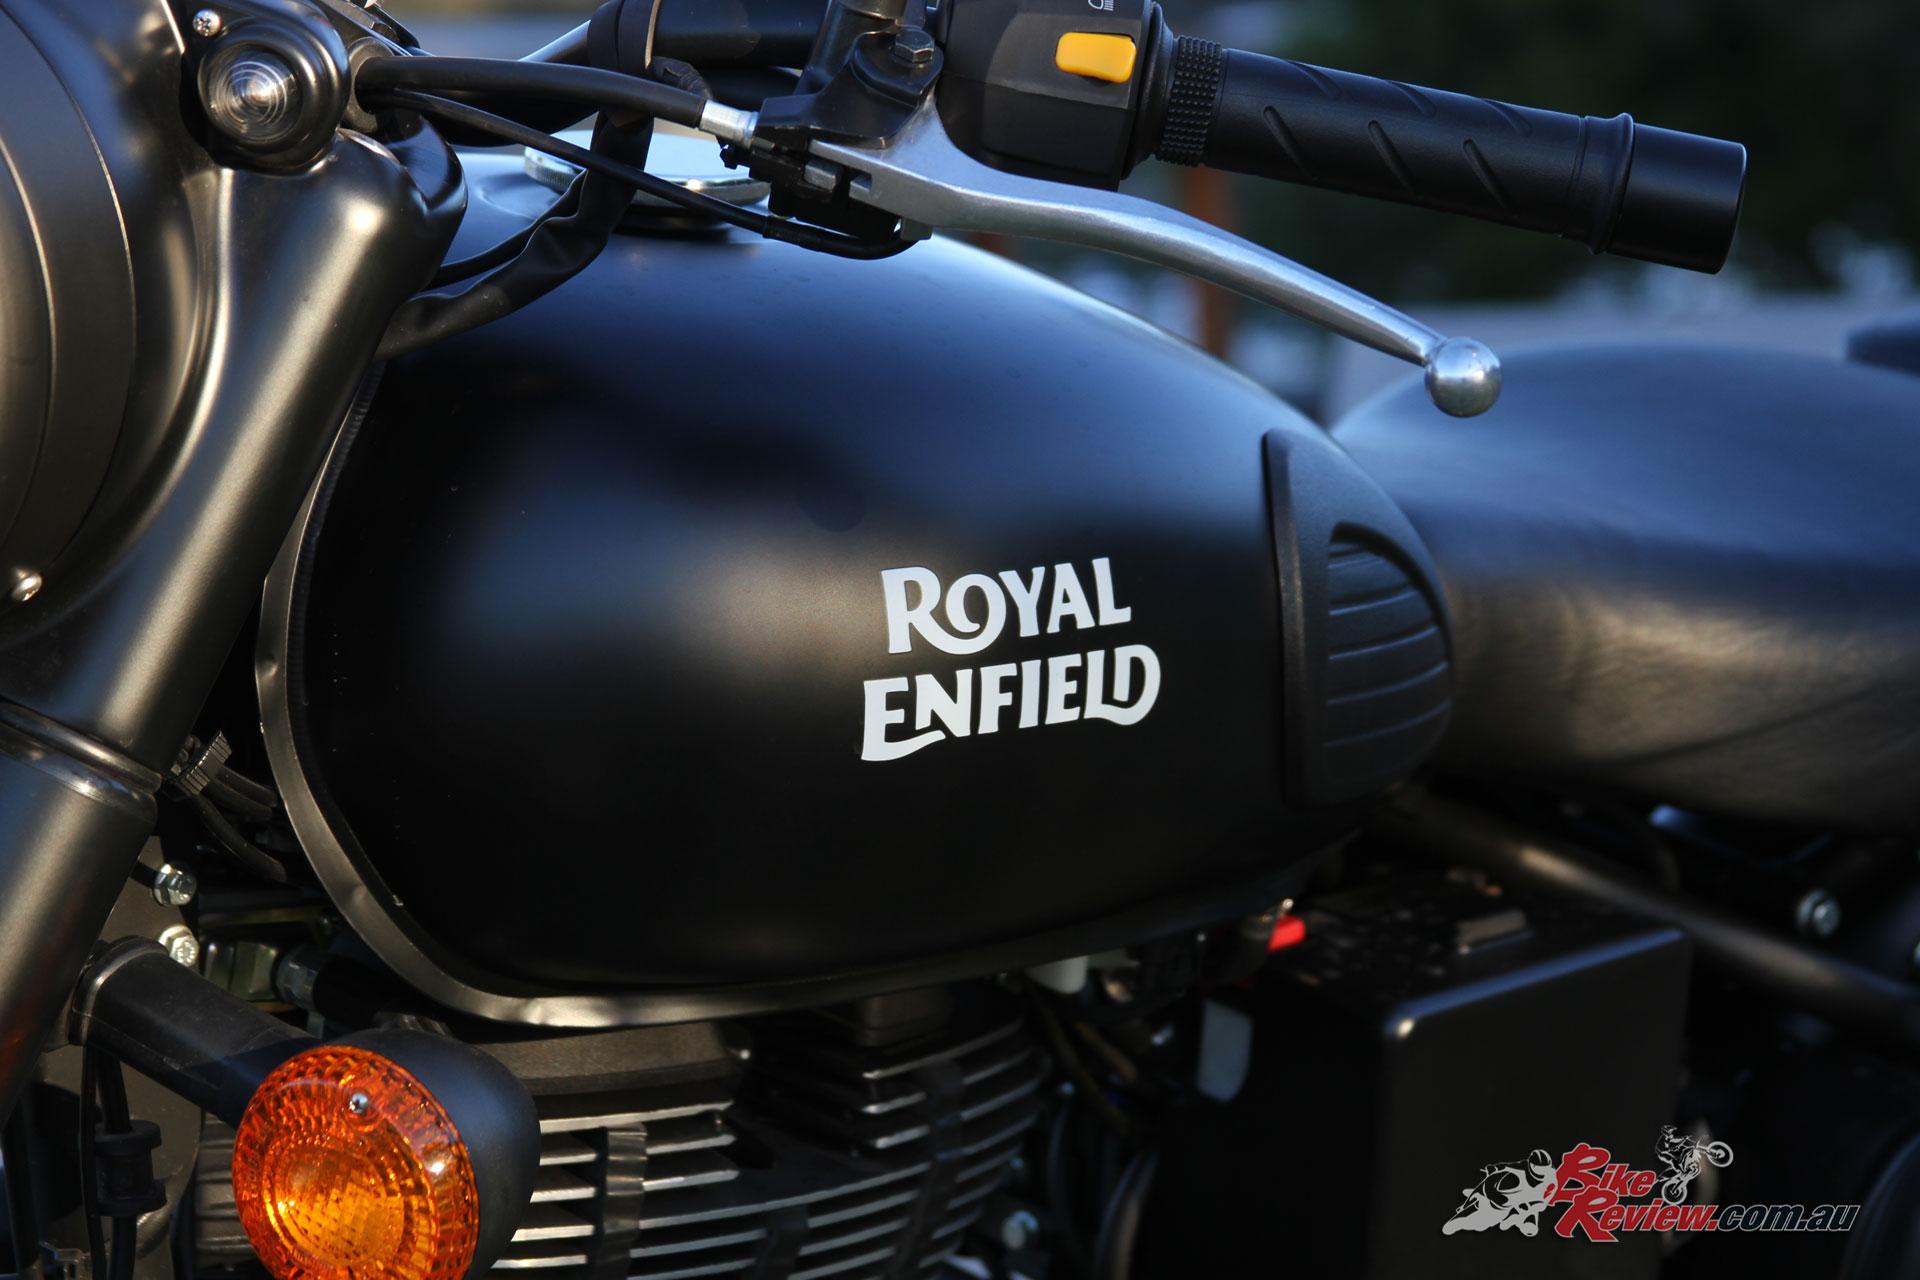 Royal Enfield Stealth Black Abs 1920x1280 Wallpaper Teahub Io